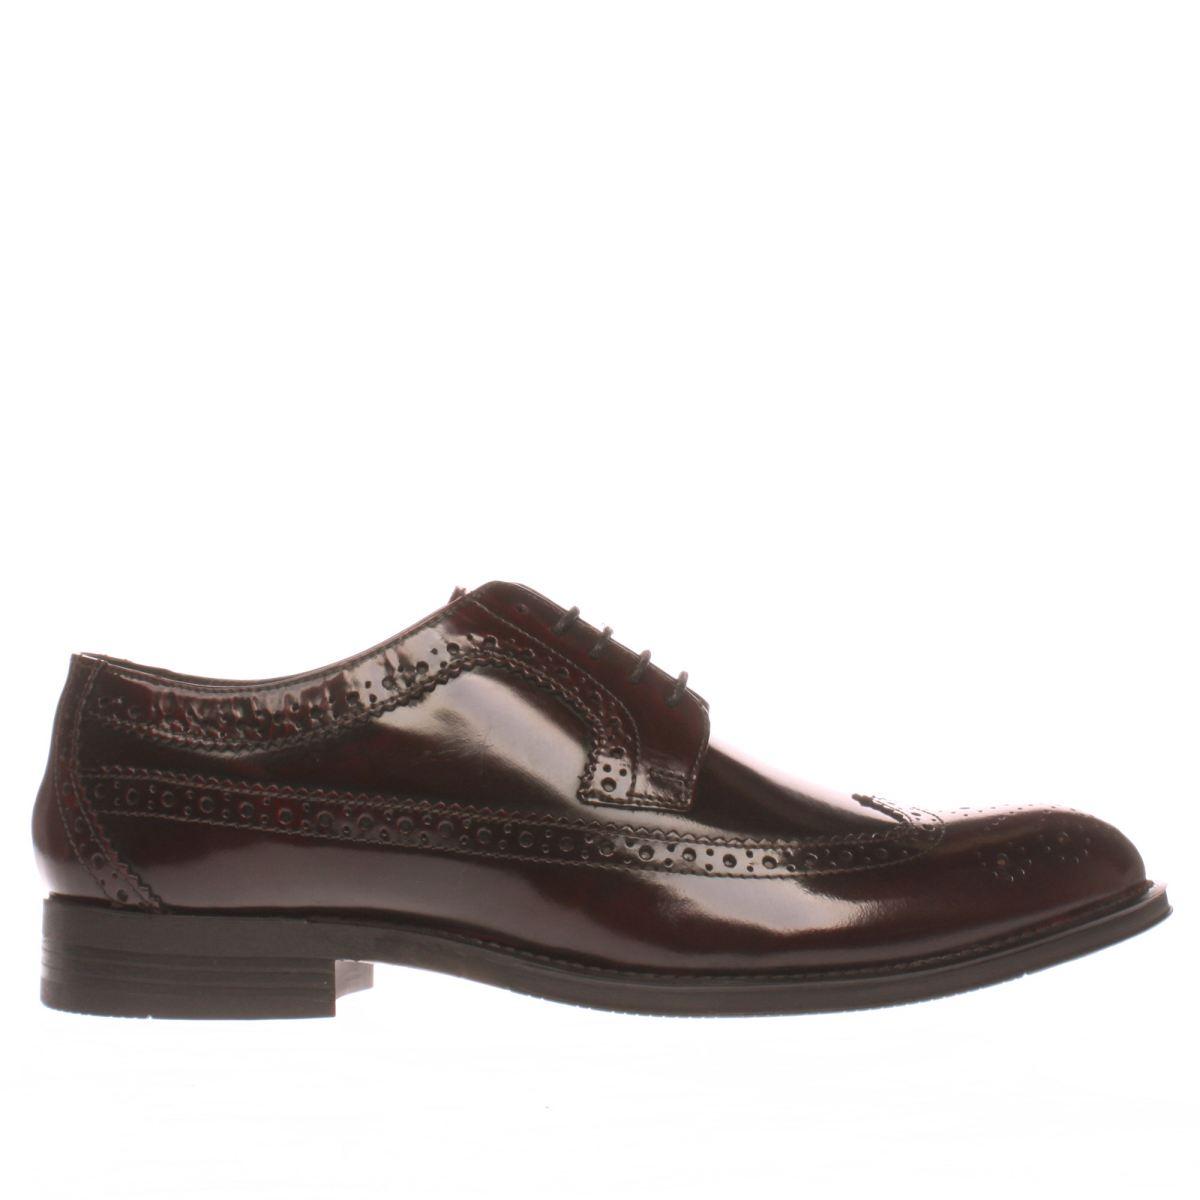 Ikon Ikon Burgundy Nottingham Brogue Shoes